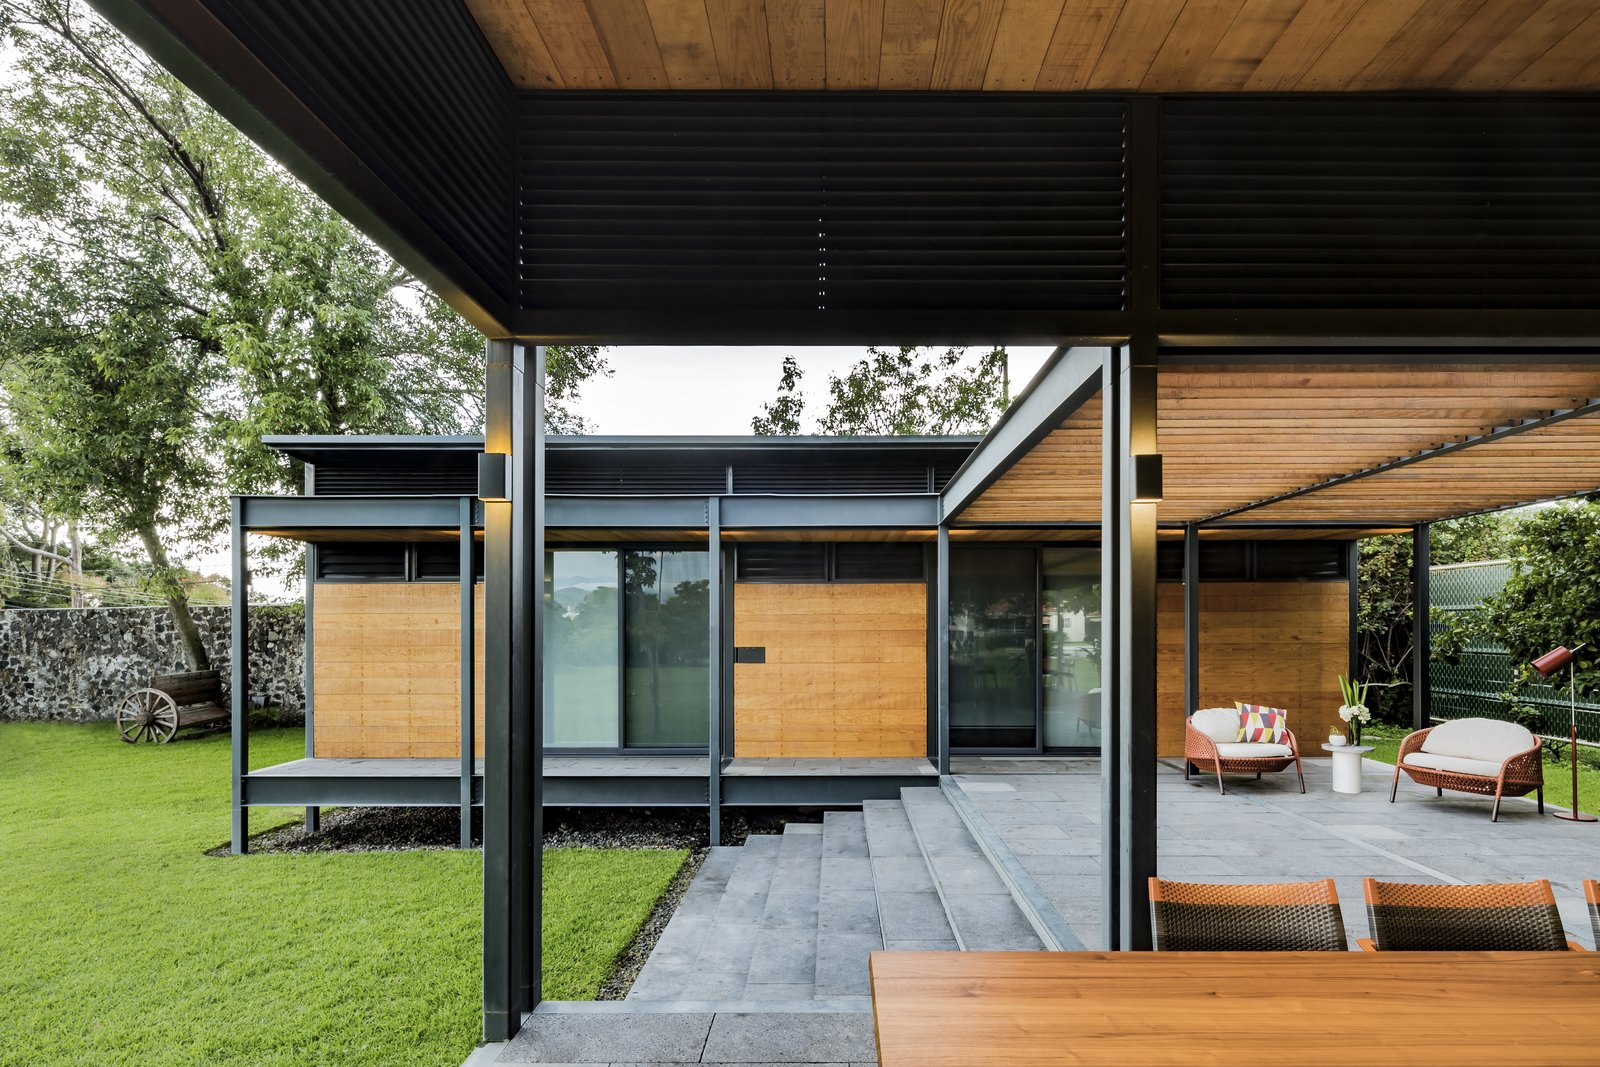 Exterior Metal Siding Material Roof Wood Flat Roofline